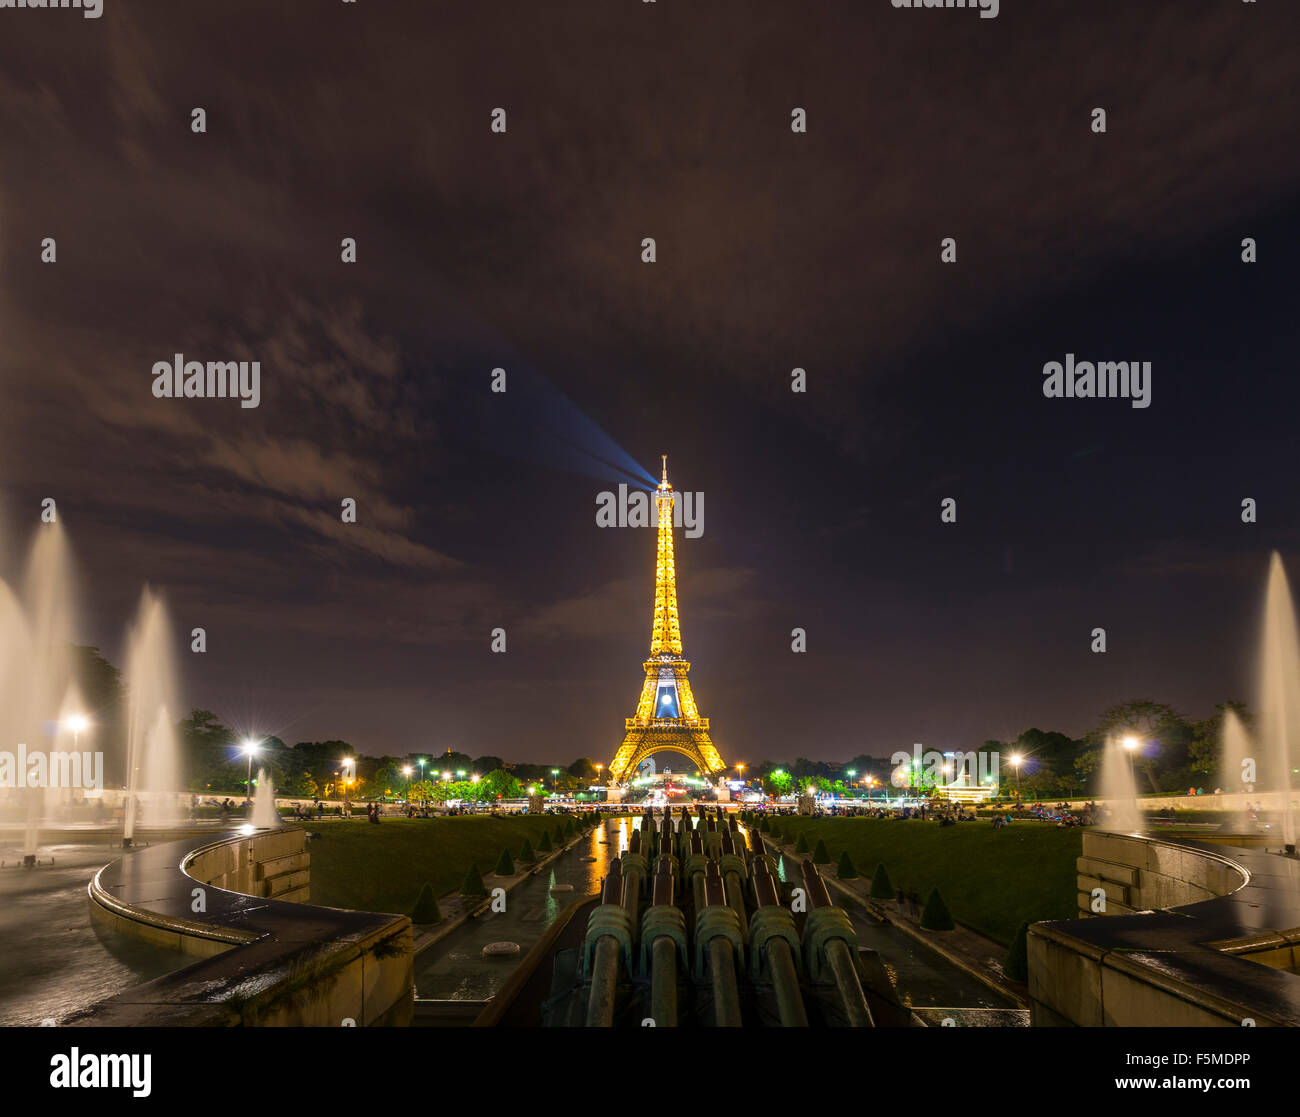 Illuminated Eiffel Tower at night, water fountains at Trocadero, tour Eiffel, Paris, Ile-de-France, France Stock Photo